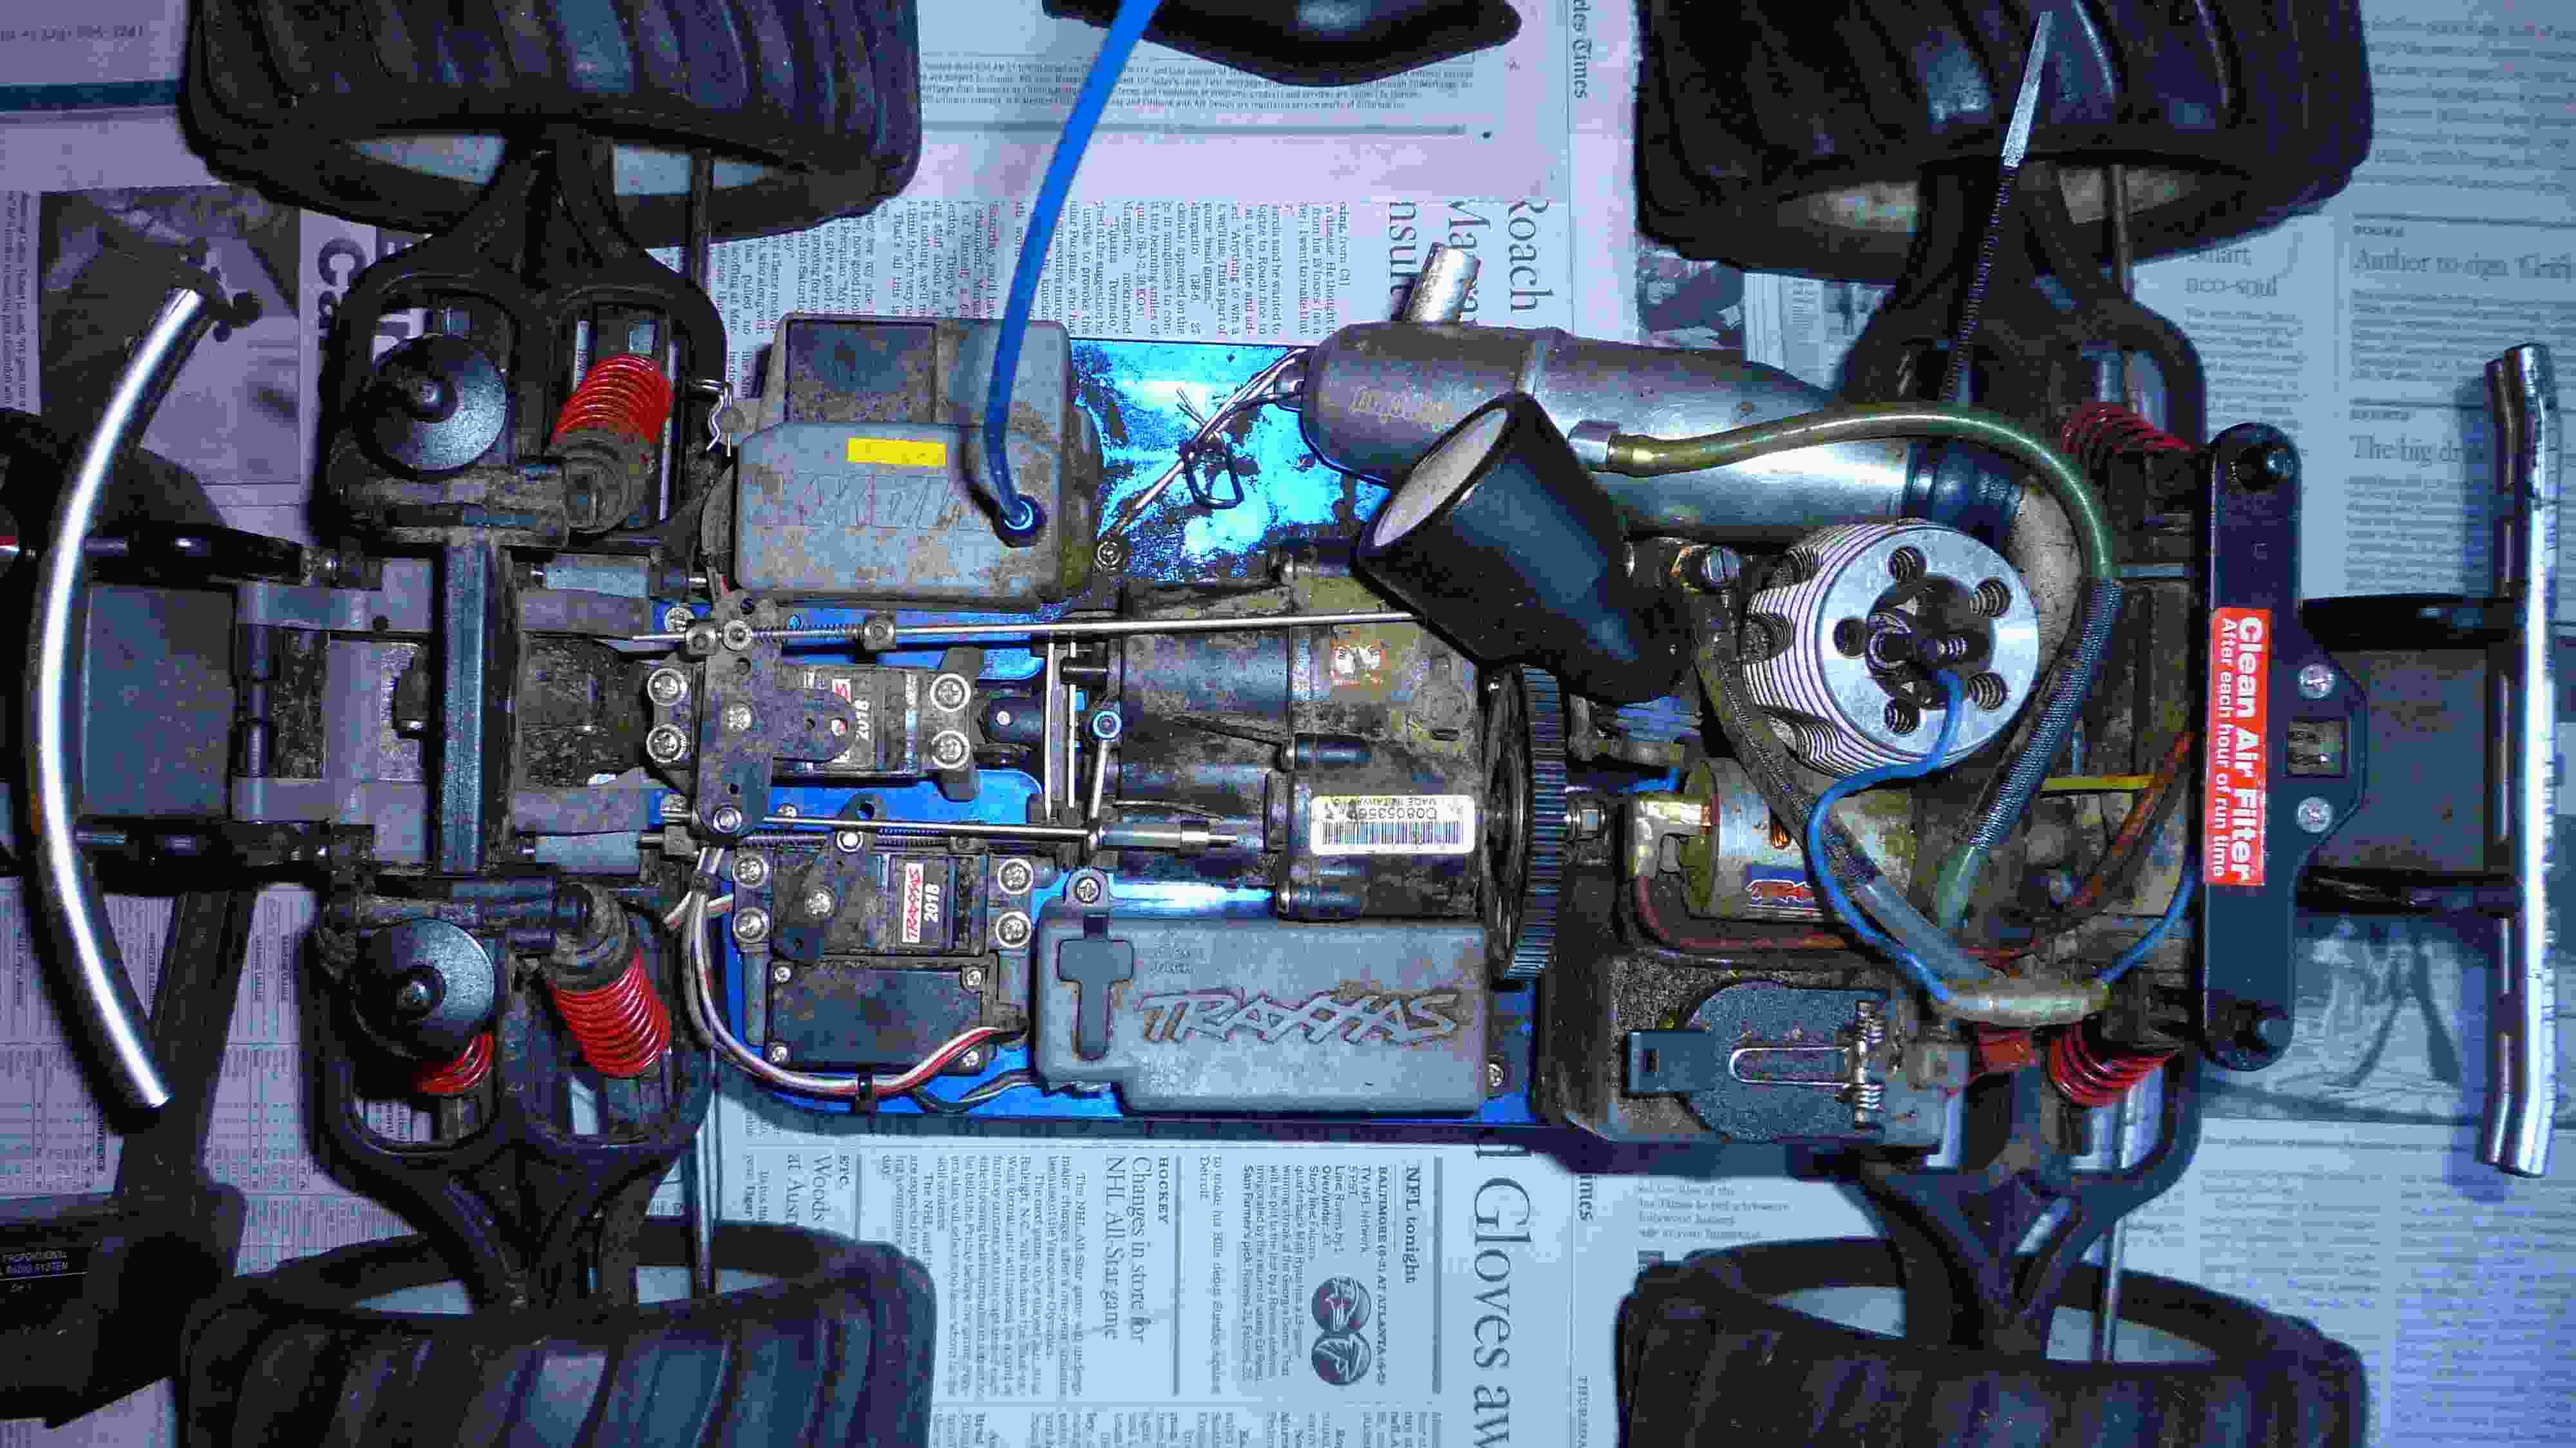 Traxxas 2 5 Engine Diagram Change Your Idea With Wiring Nitro Rustler Parts For T Maxx Slayer R C Tech Forums Rh Rctech Net 25 List